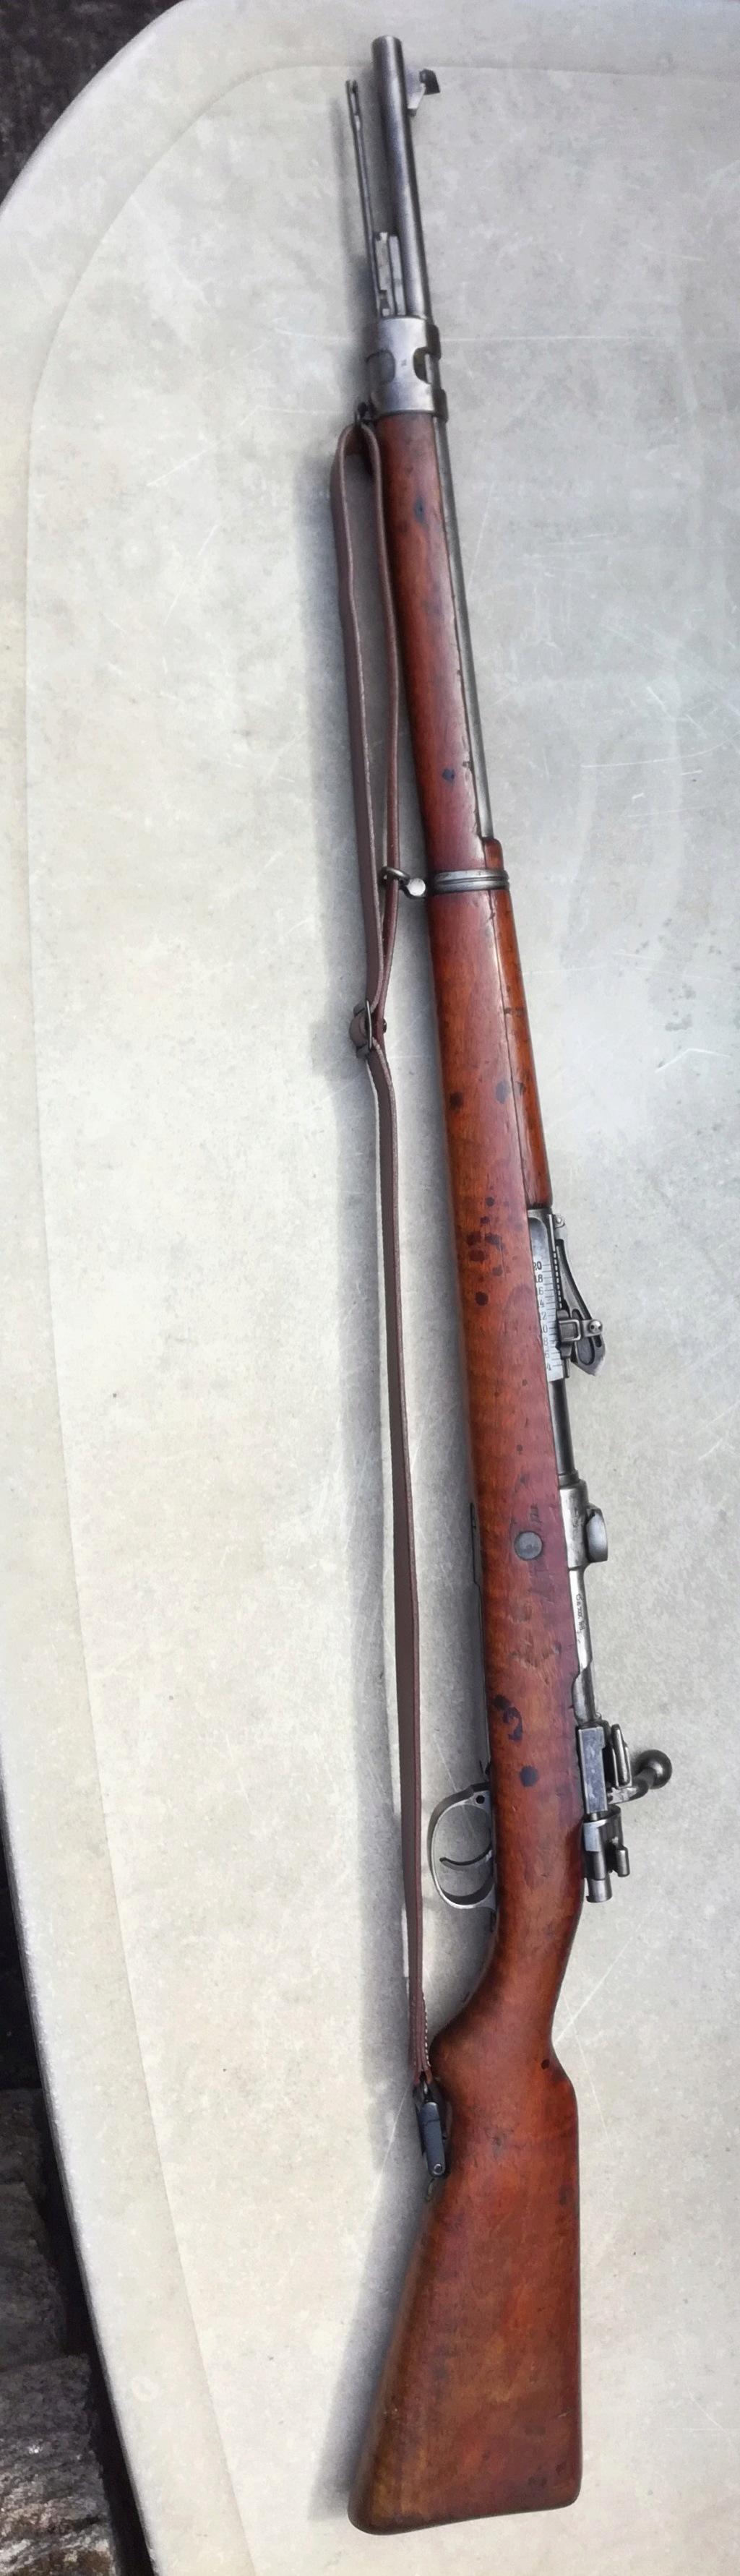 G98 à embases et montage lunette sniper WW1 Img_2038